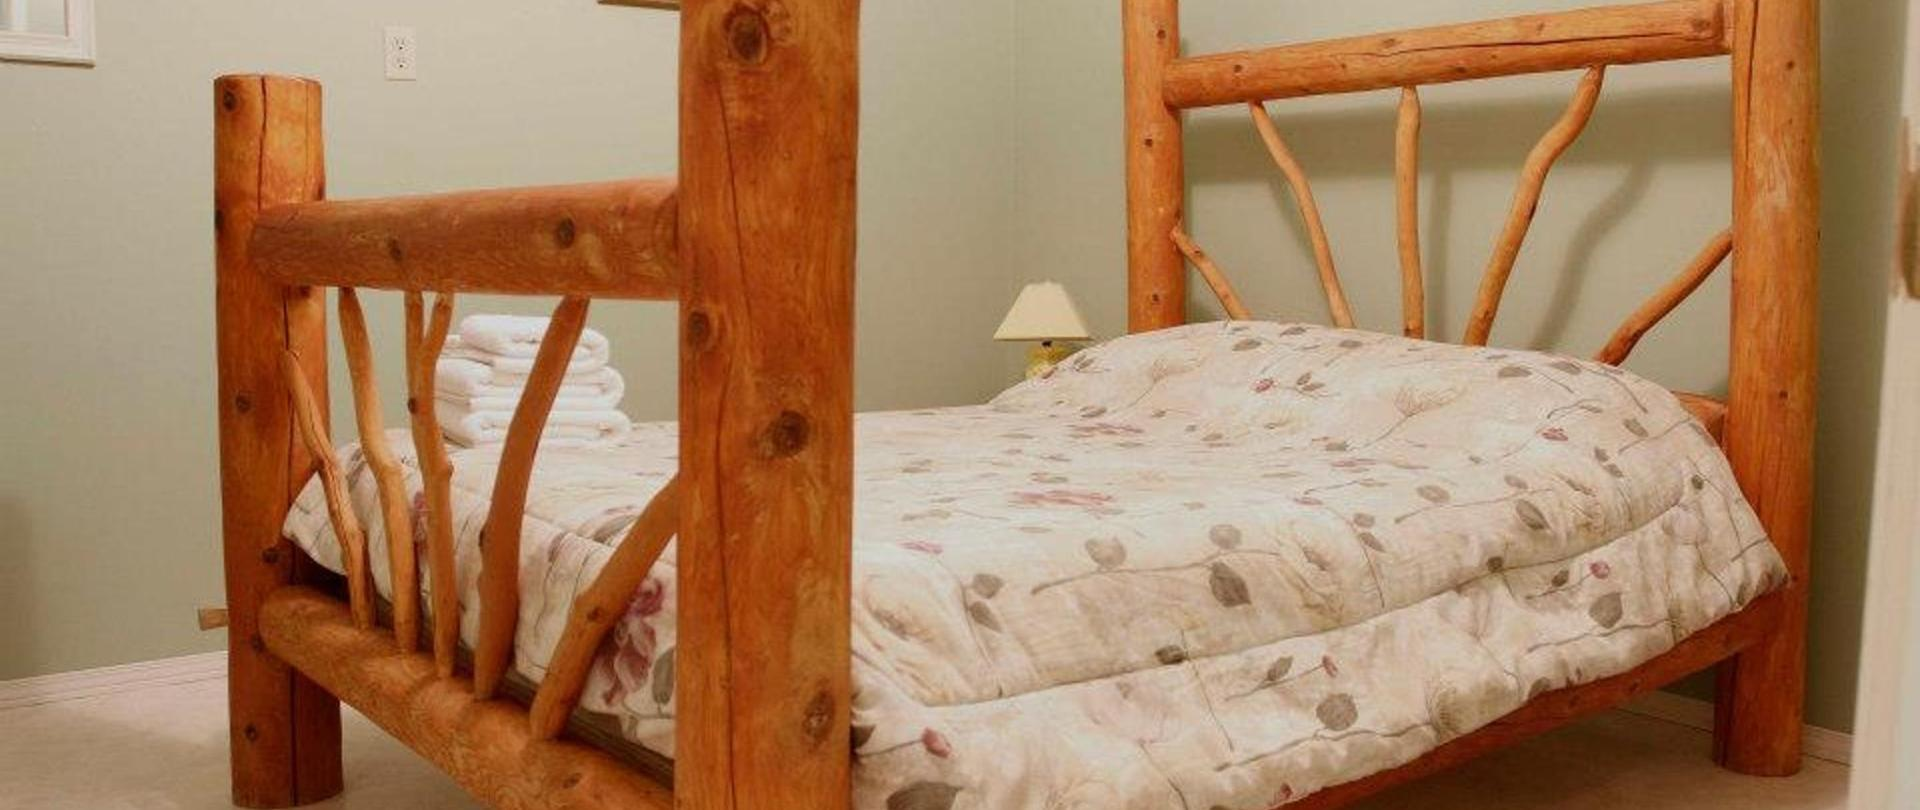 room 1 - mad musher.jpg